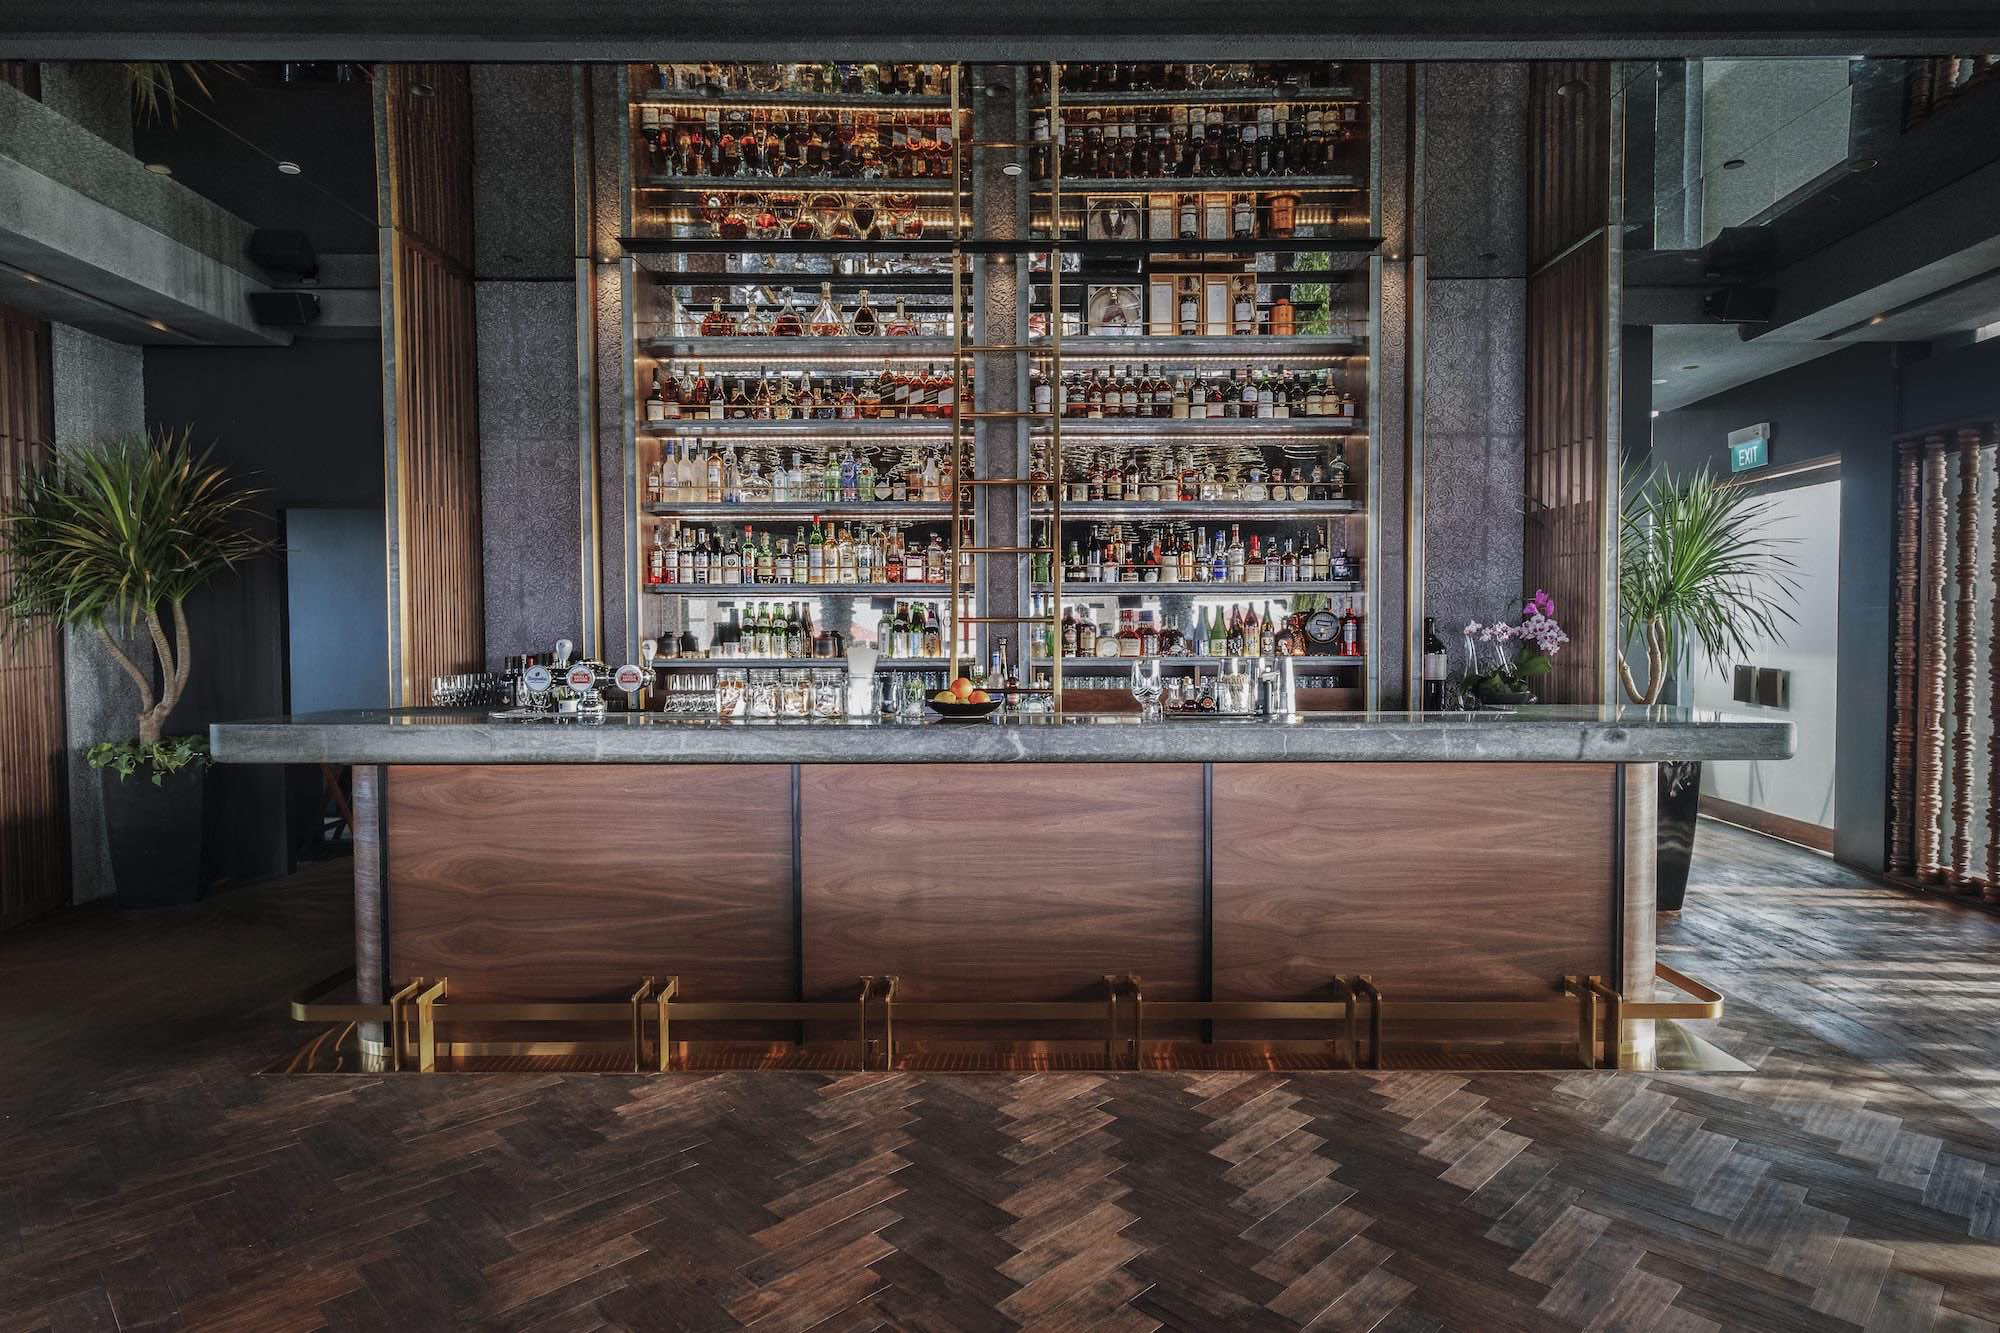 CE LA VI Restaurant Rooftop Bar Interiors Photography Singapore COCO Creative Studio 13-copy-2